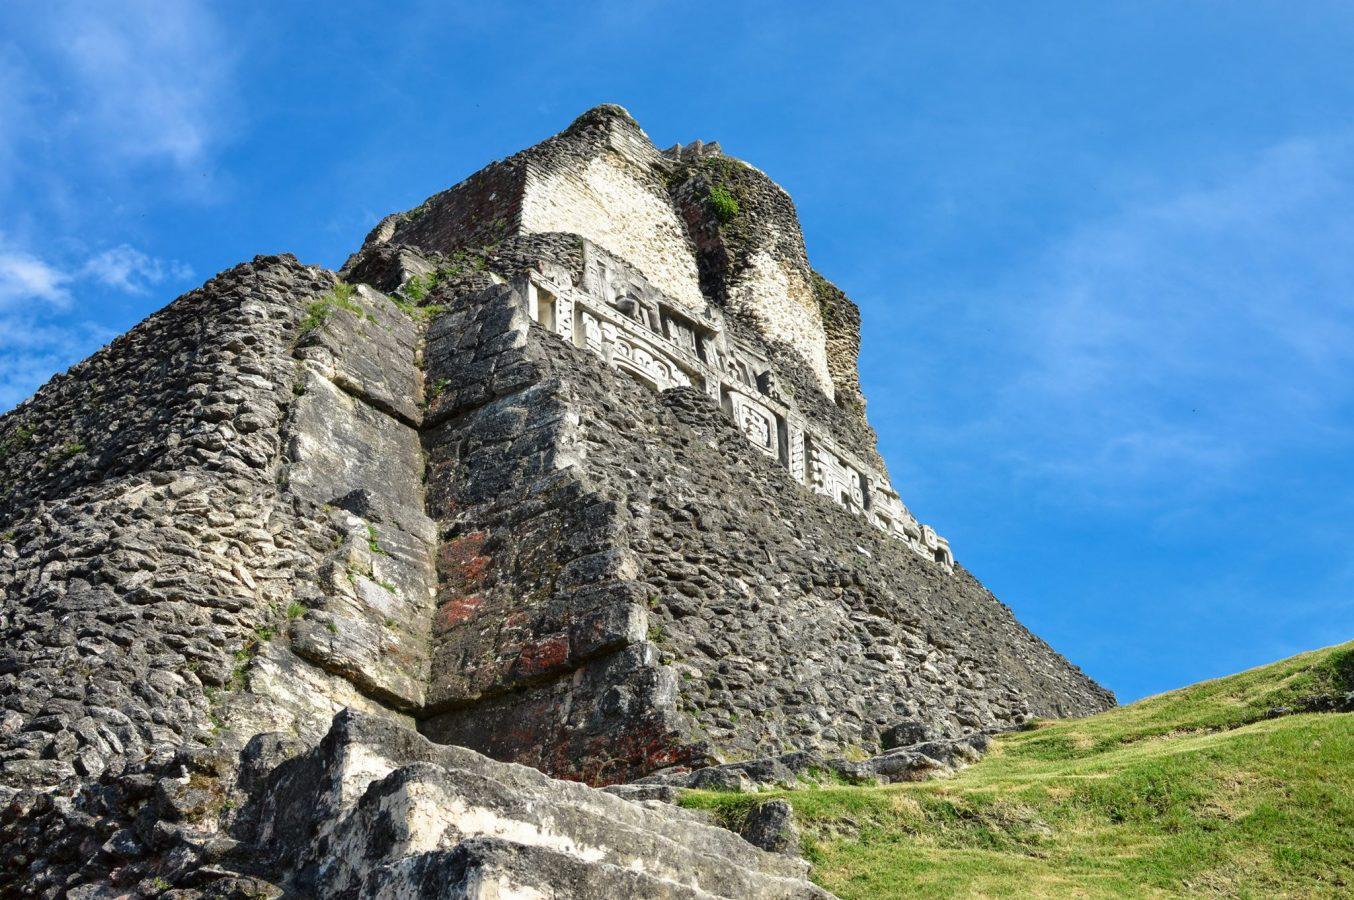 Visit Belize in Autumn